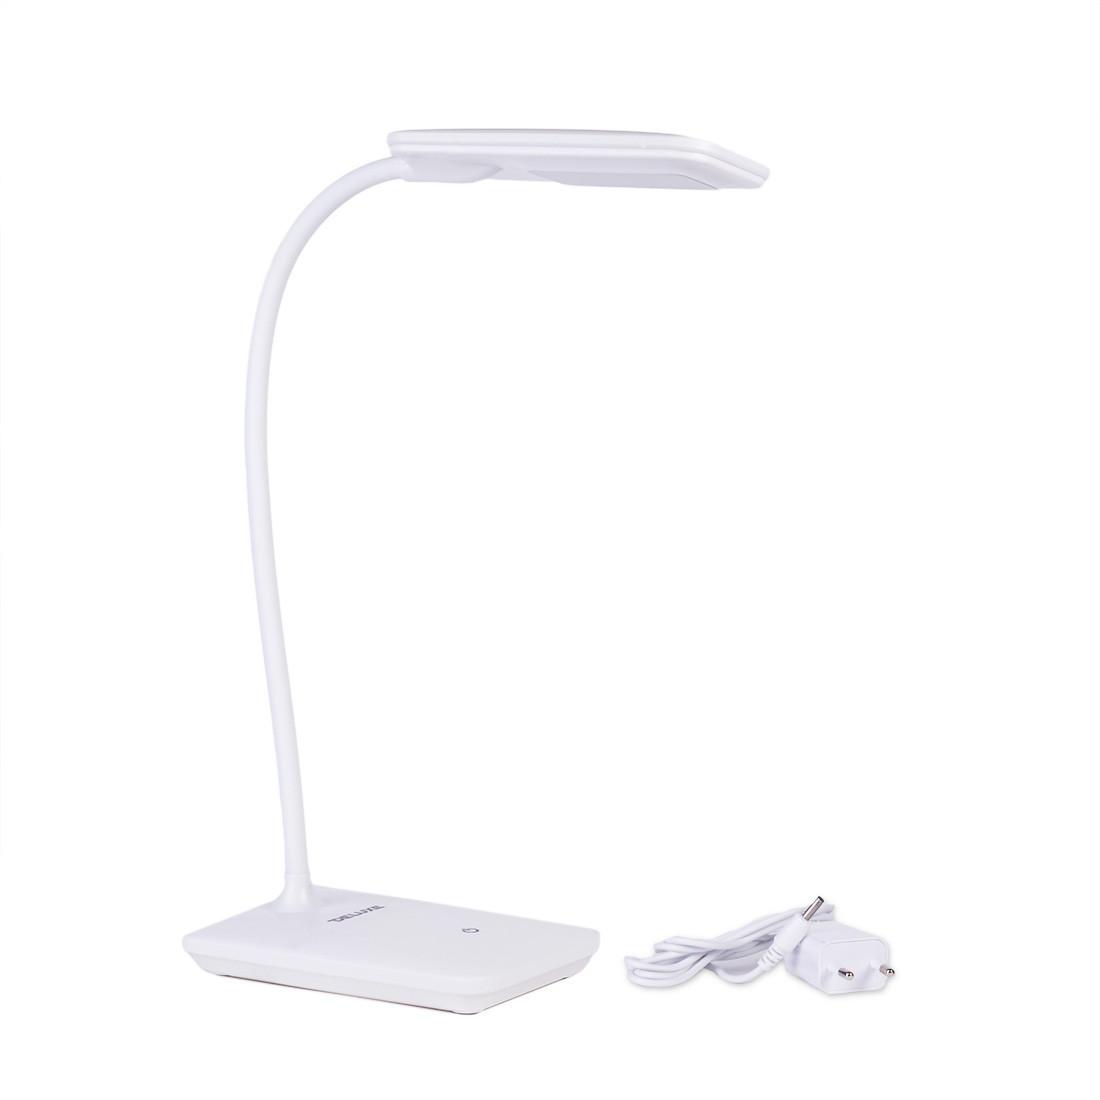 Лампа настольная светодиодная (LED) Deluxe DLTL-102W-6W, Регулировка яркости: 3 степени яркости, Цветовая темп